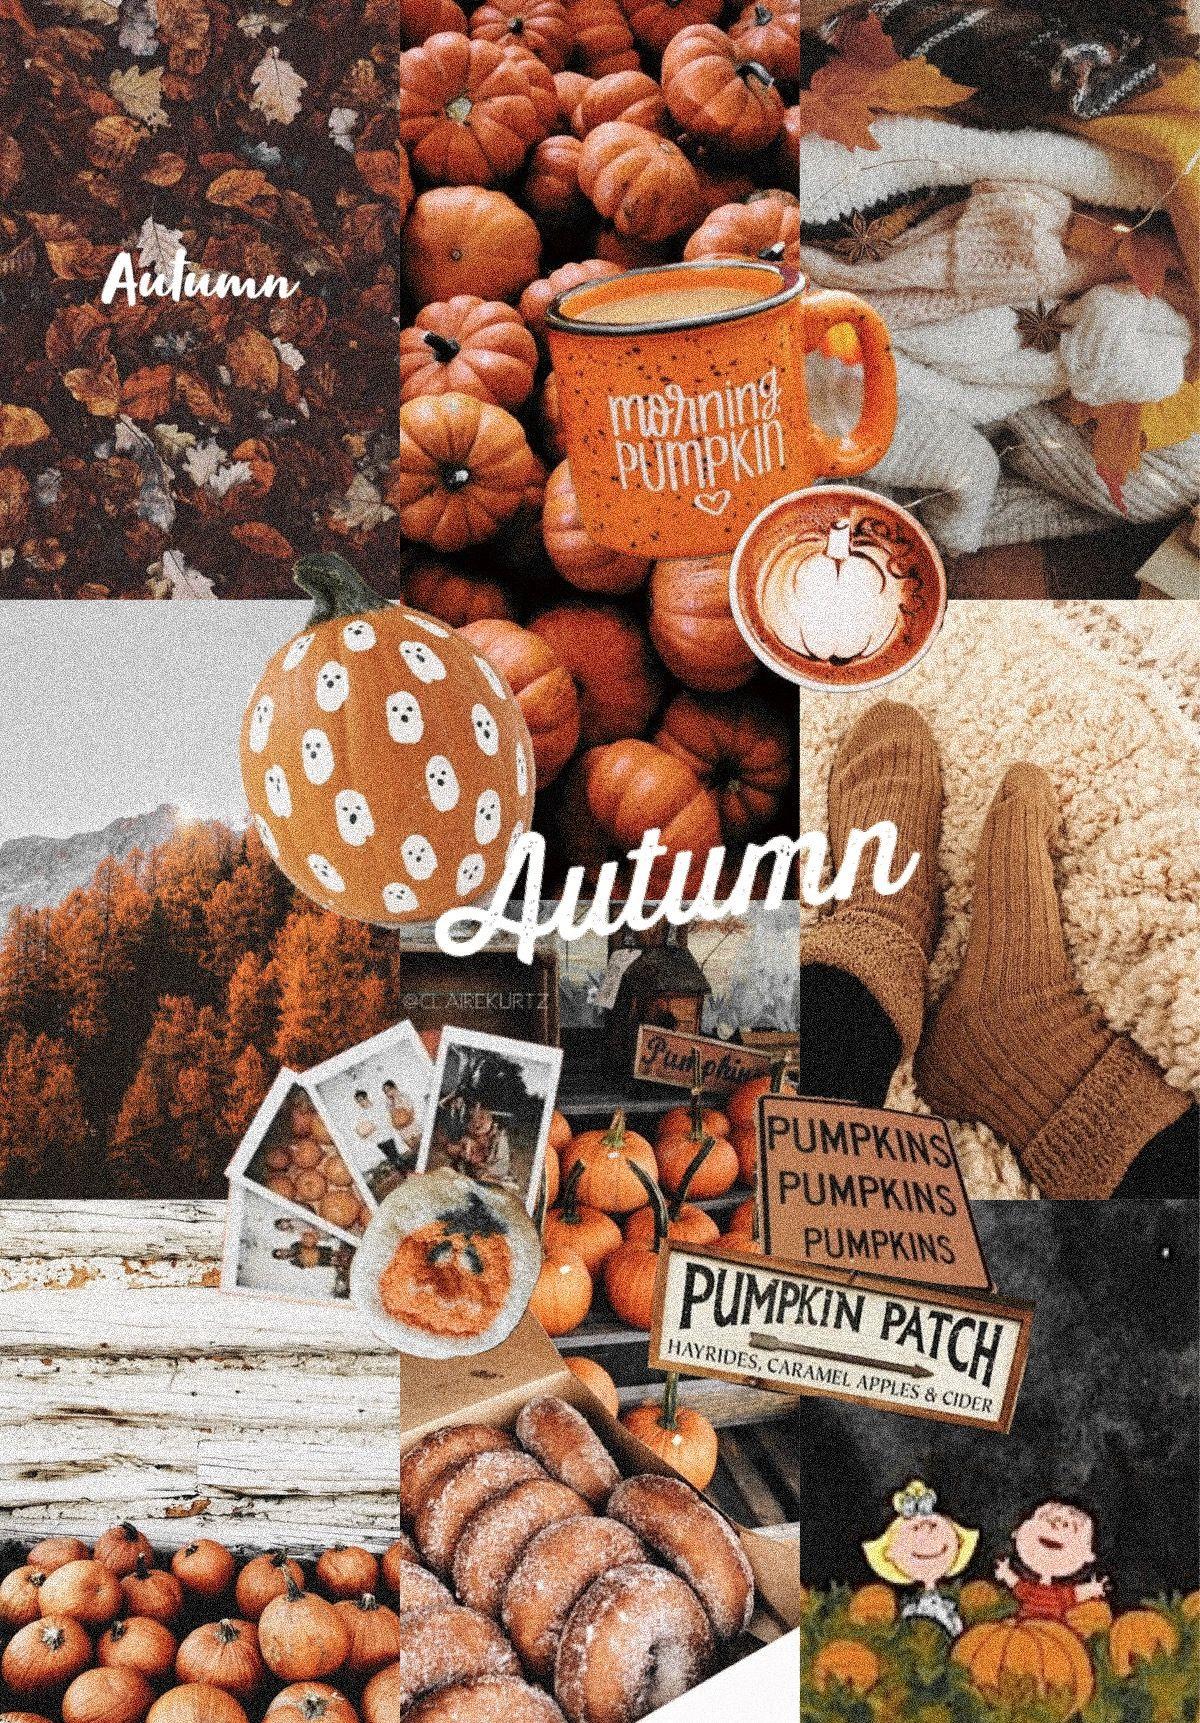 Autumn Fall Aesthetic Vsco Collage Iphone Wallpaper Iphone Wallpaper Fall Halloween Wallpaper Iphone Halloween Wallpaper